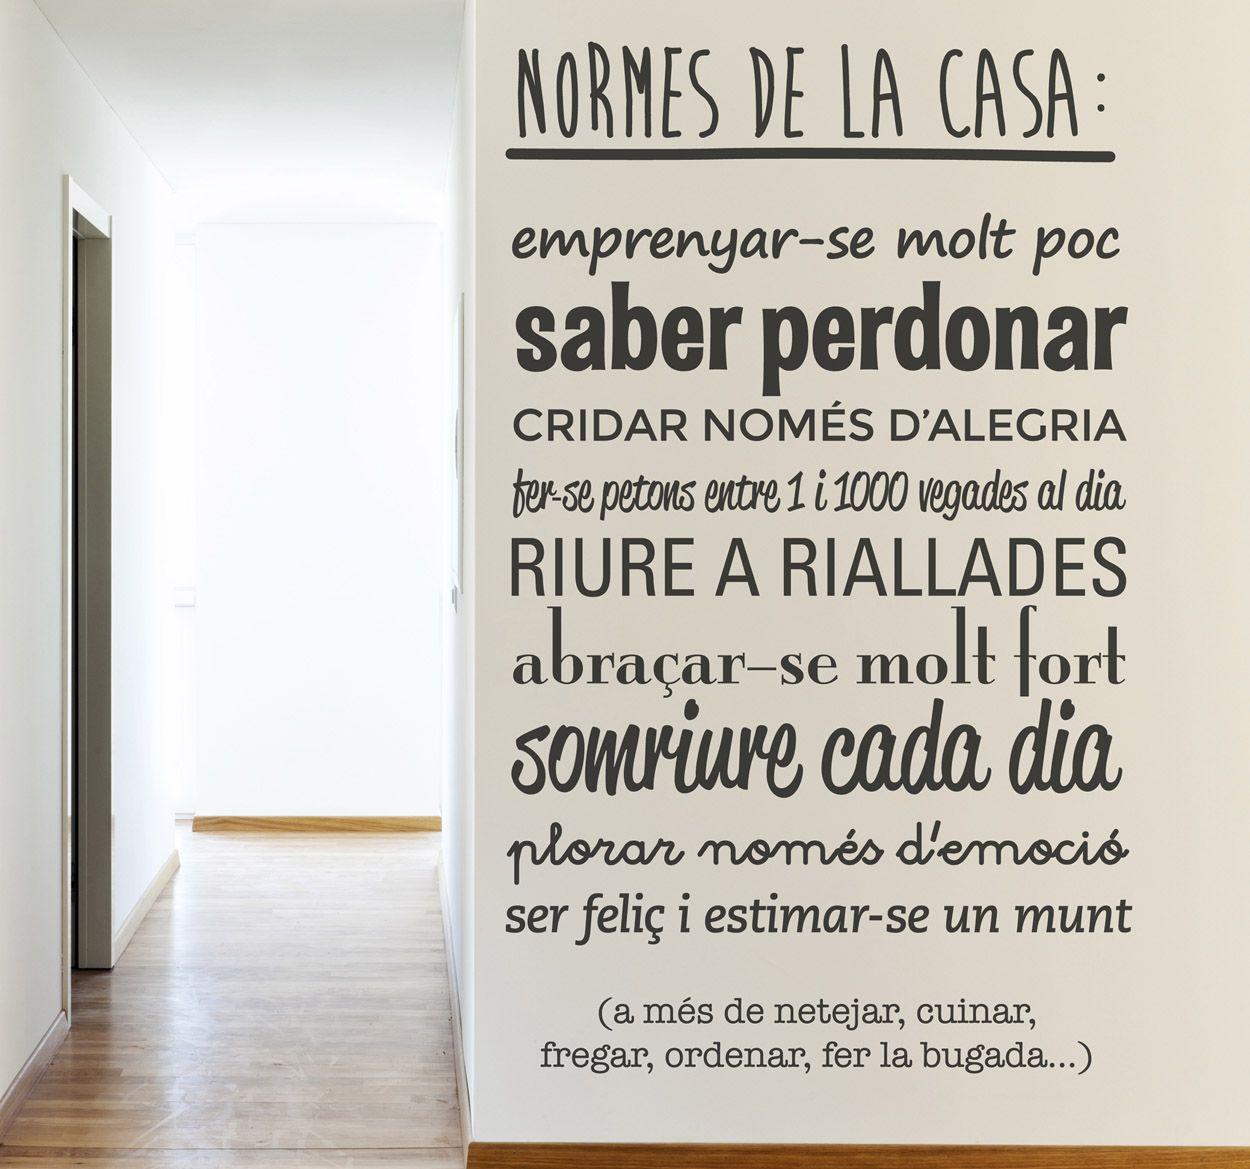 Vinilo Catala Normes Casa Vinilos Frases Frases En Catalan